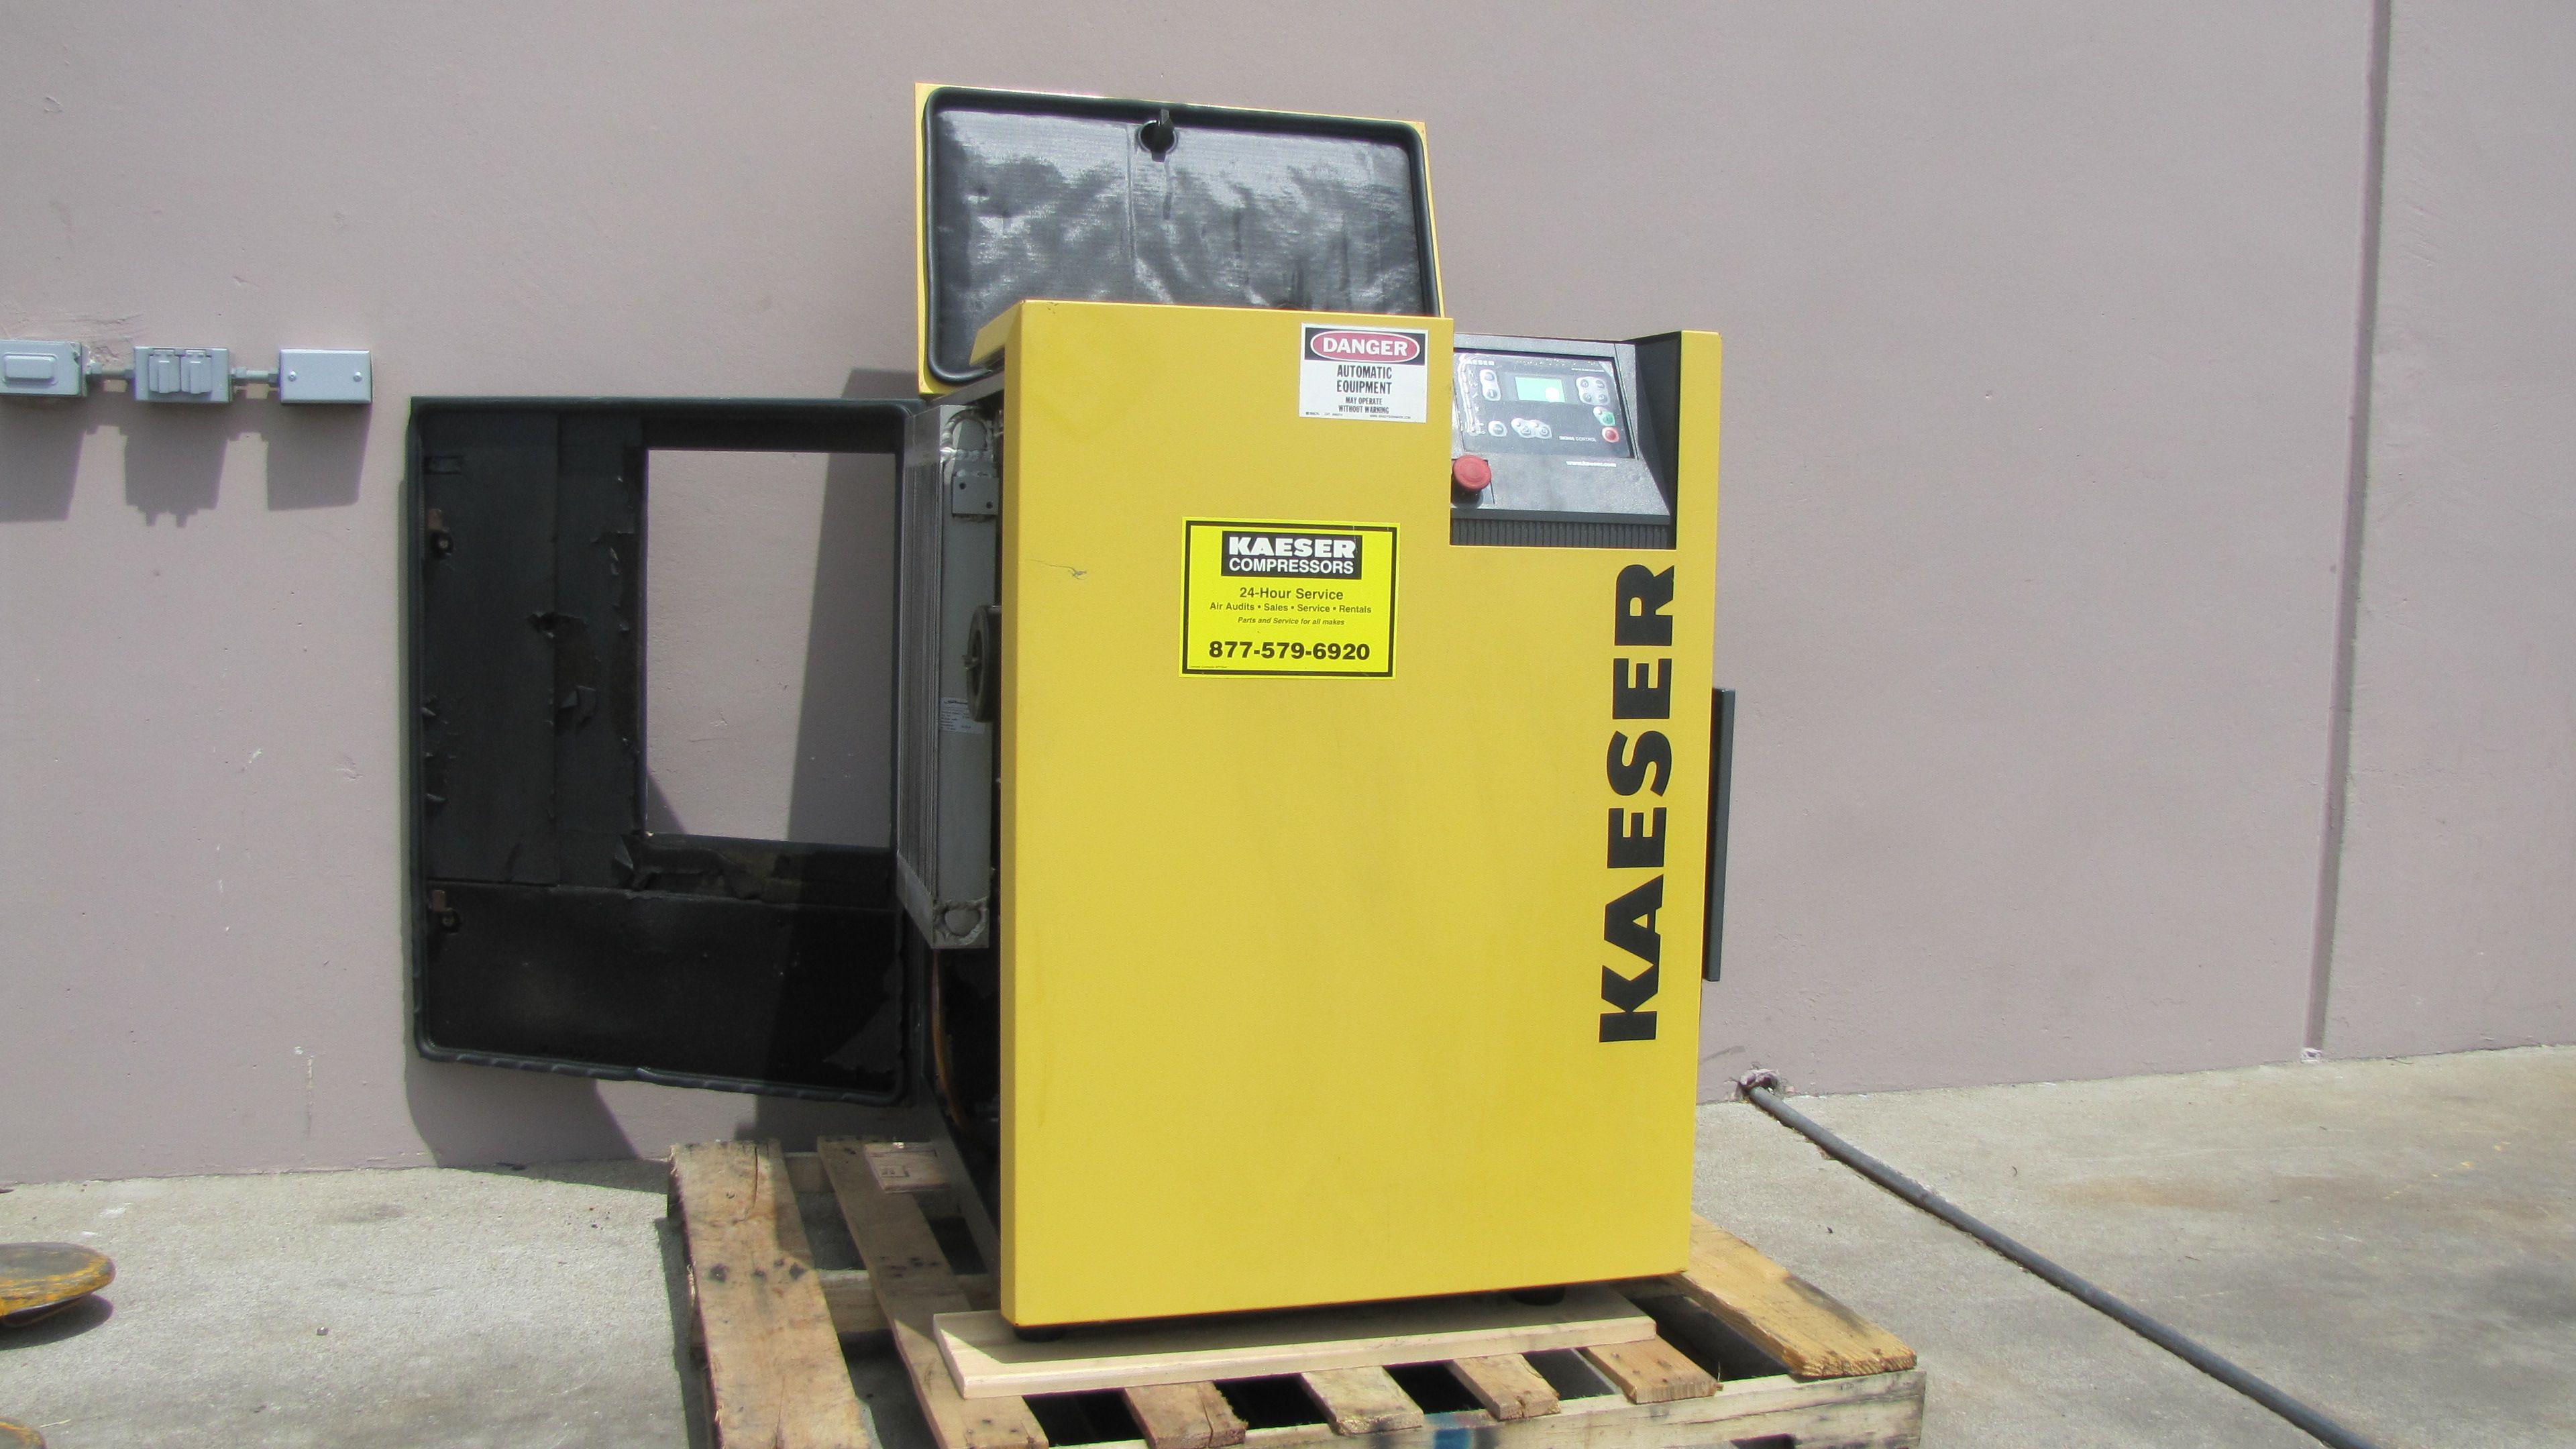 Kaeser rotary screw compressor Locker storage, Air